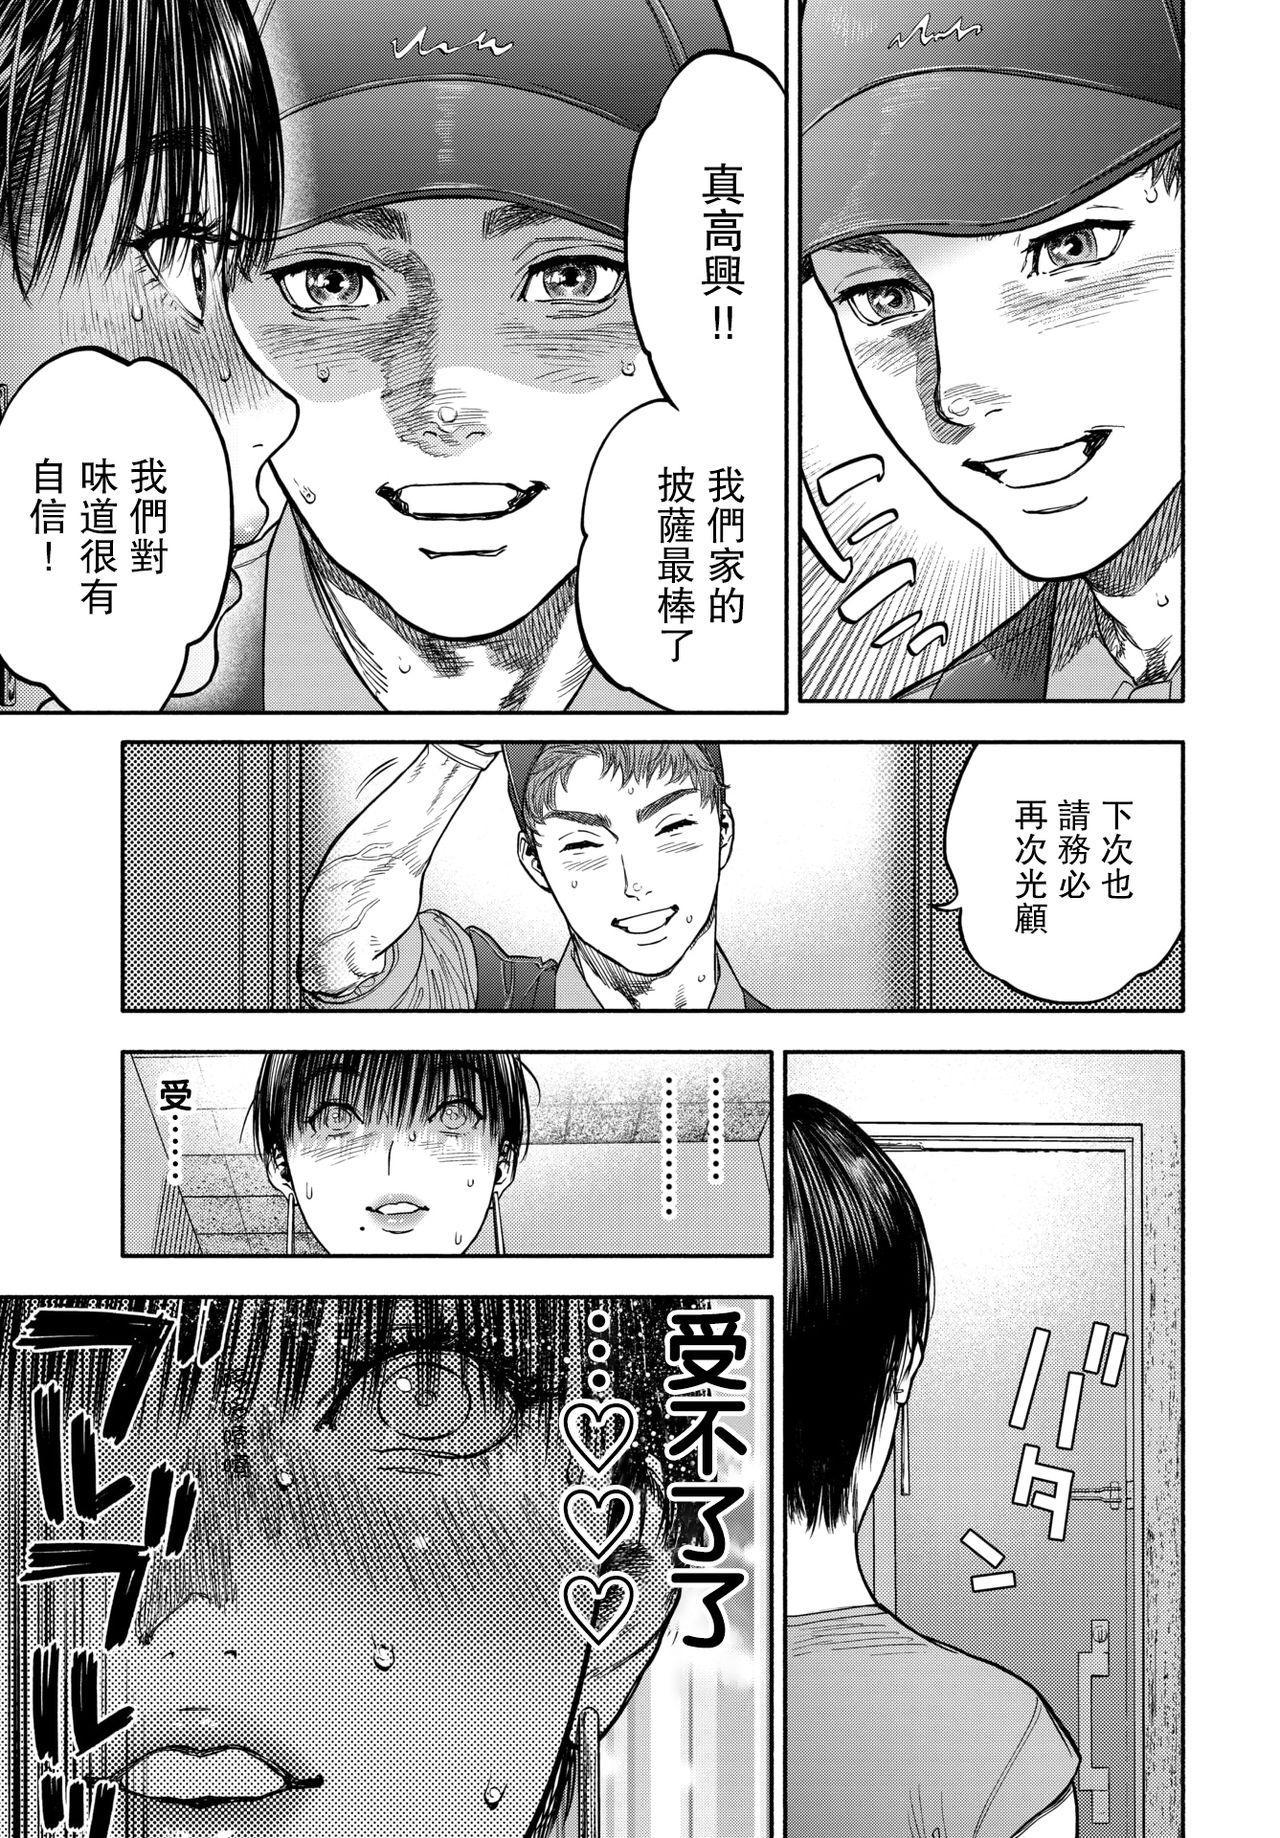 [usa] 45-fun de Kare o Todokete - Delivery Love (COMIC BAVEL 2020-12) [Chinese] [路过的骑士汉化组] [Digital] 16